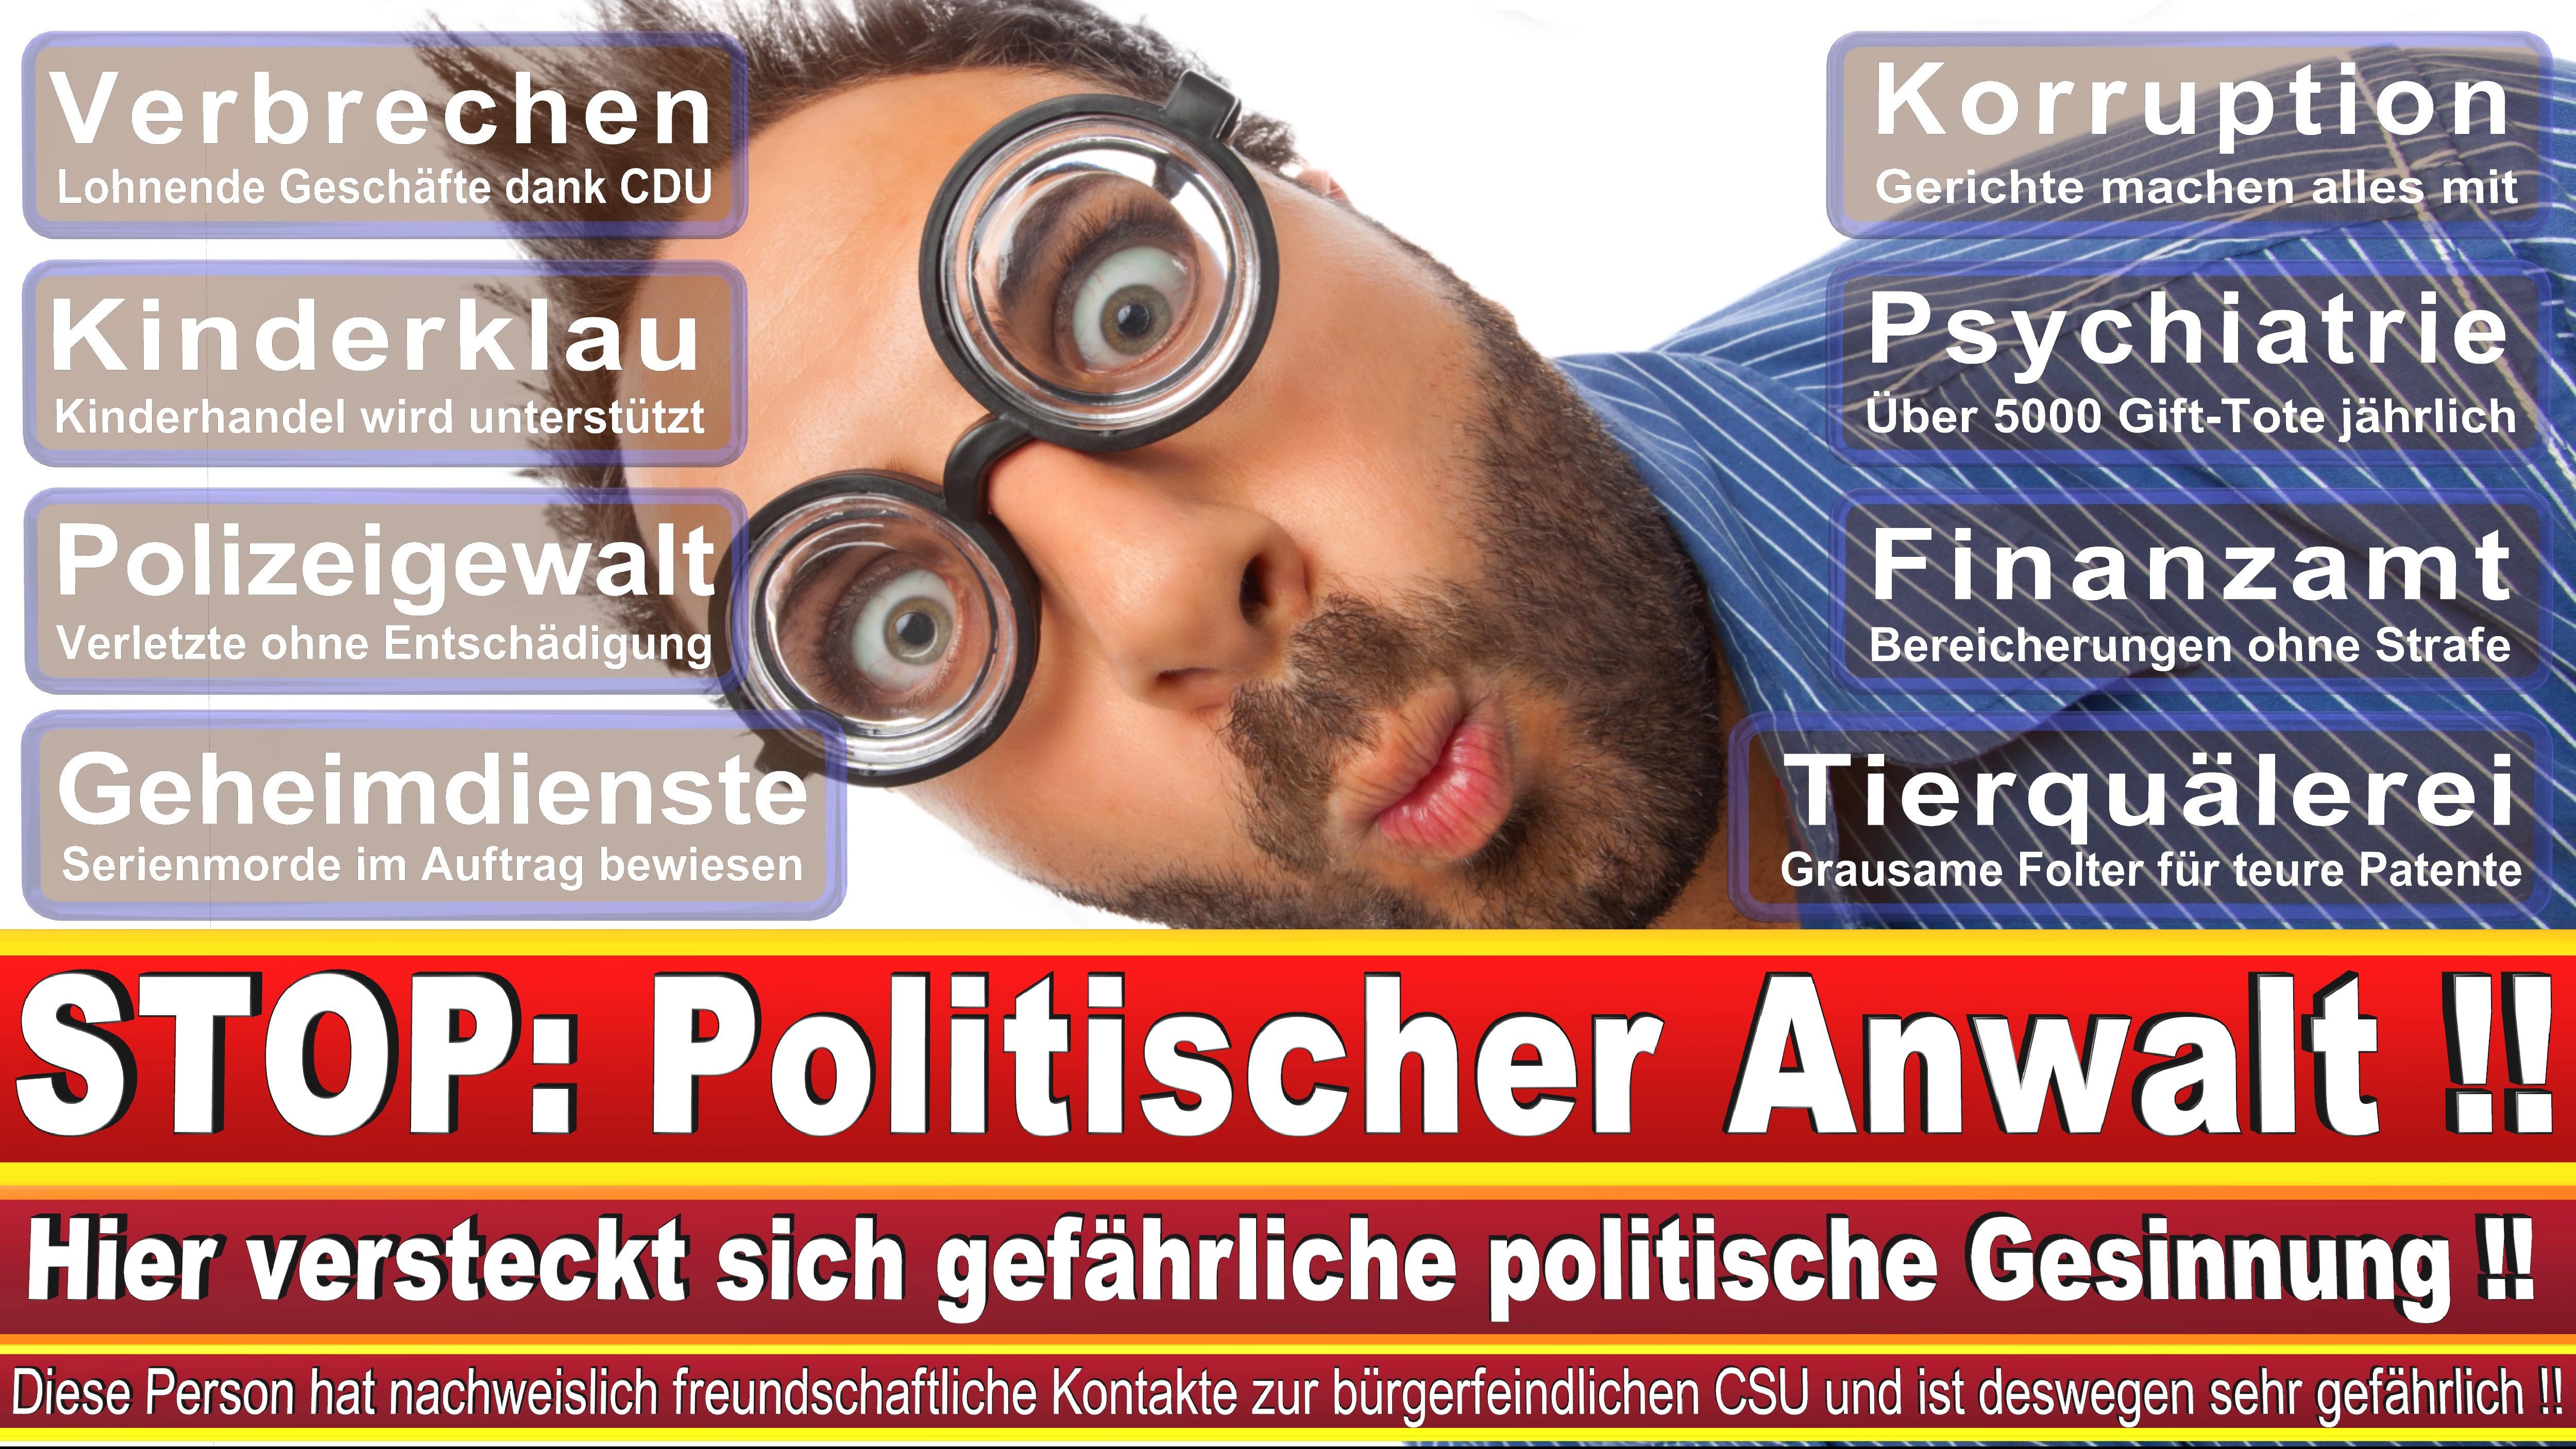 Rechtsanwältin Annette Herbst Rehau Selbstständig Rechtsanwältin Rechtsanwaltskanzlei Annette Herbst